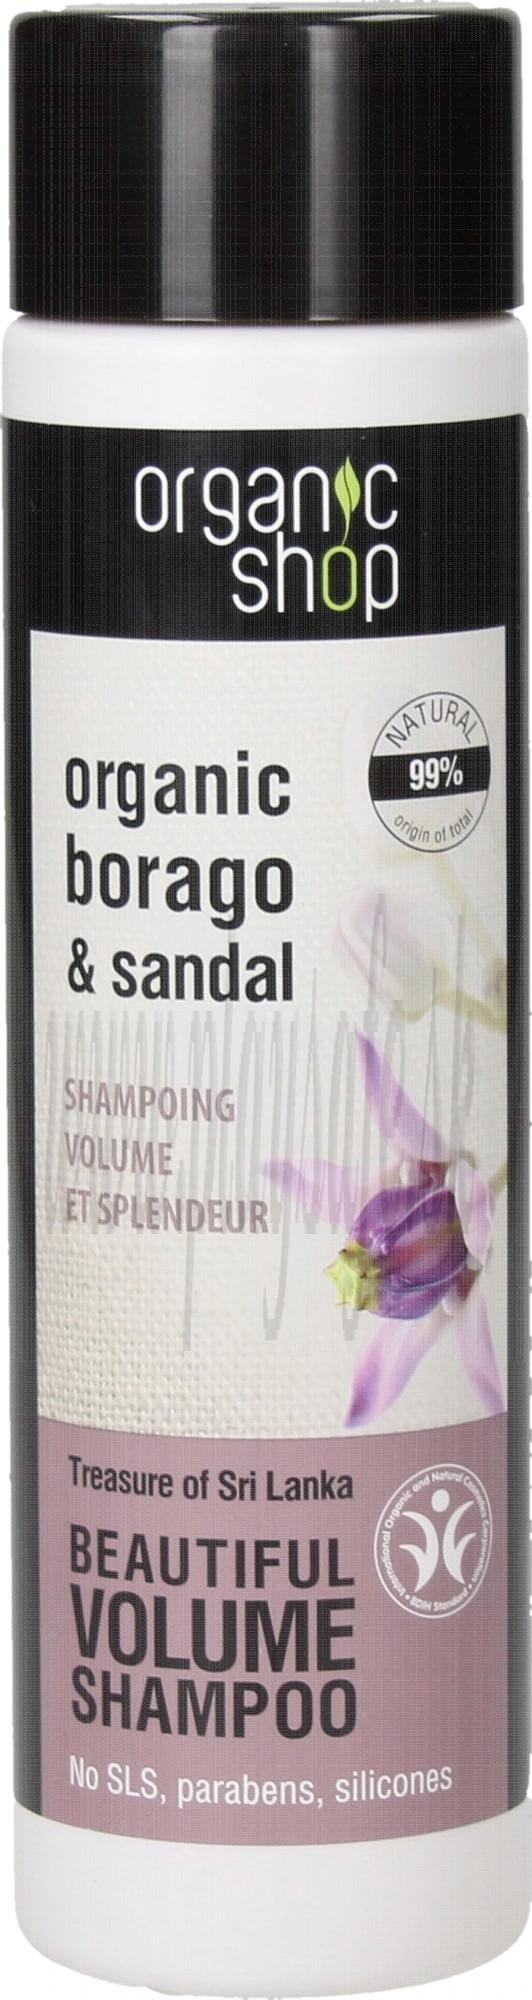 Organic Shop Šampón Volume Poklad Srí Lanky, 280ml